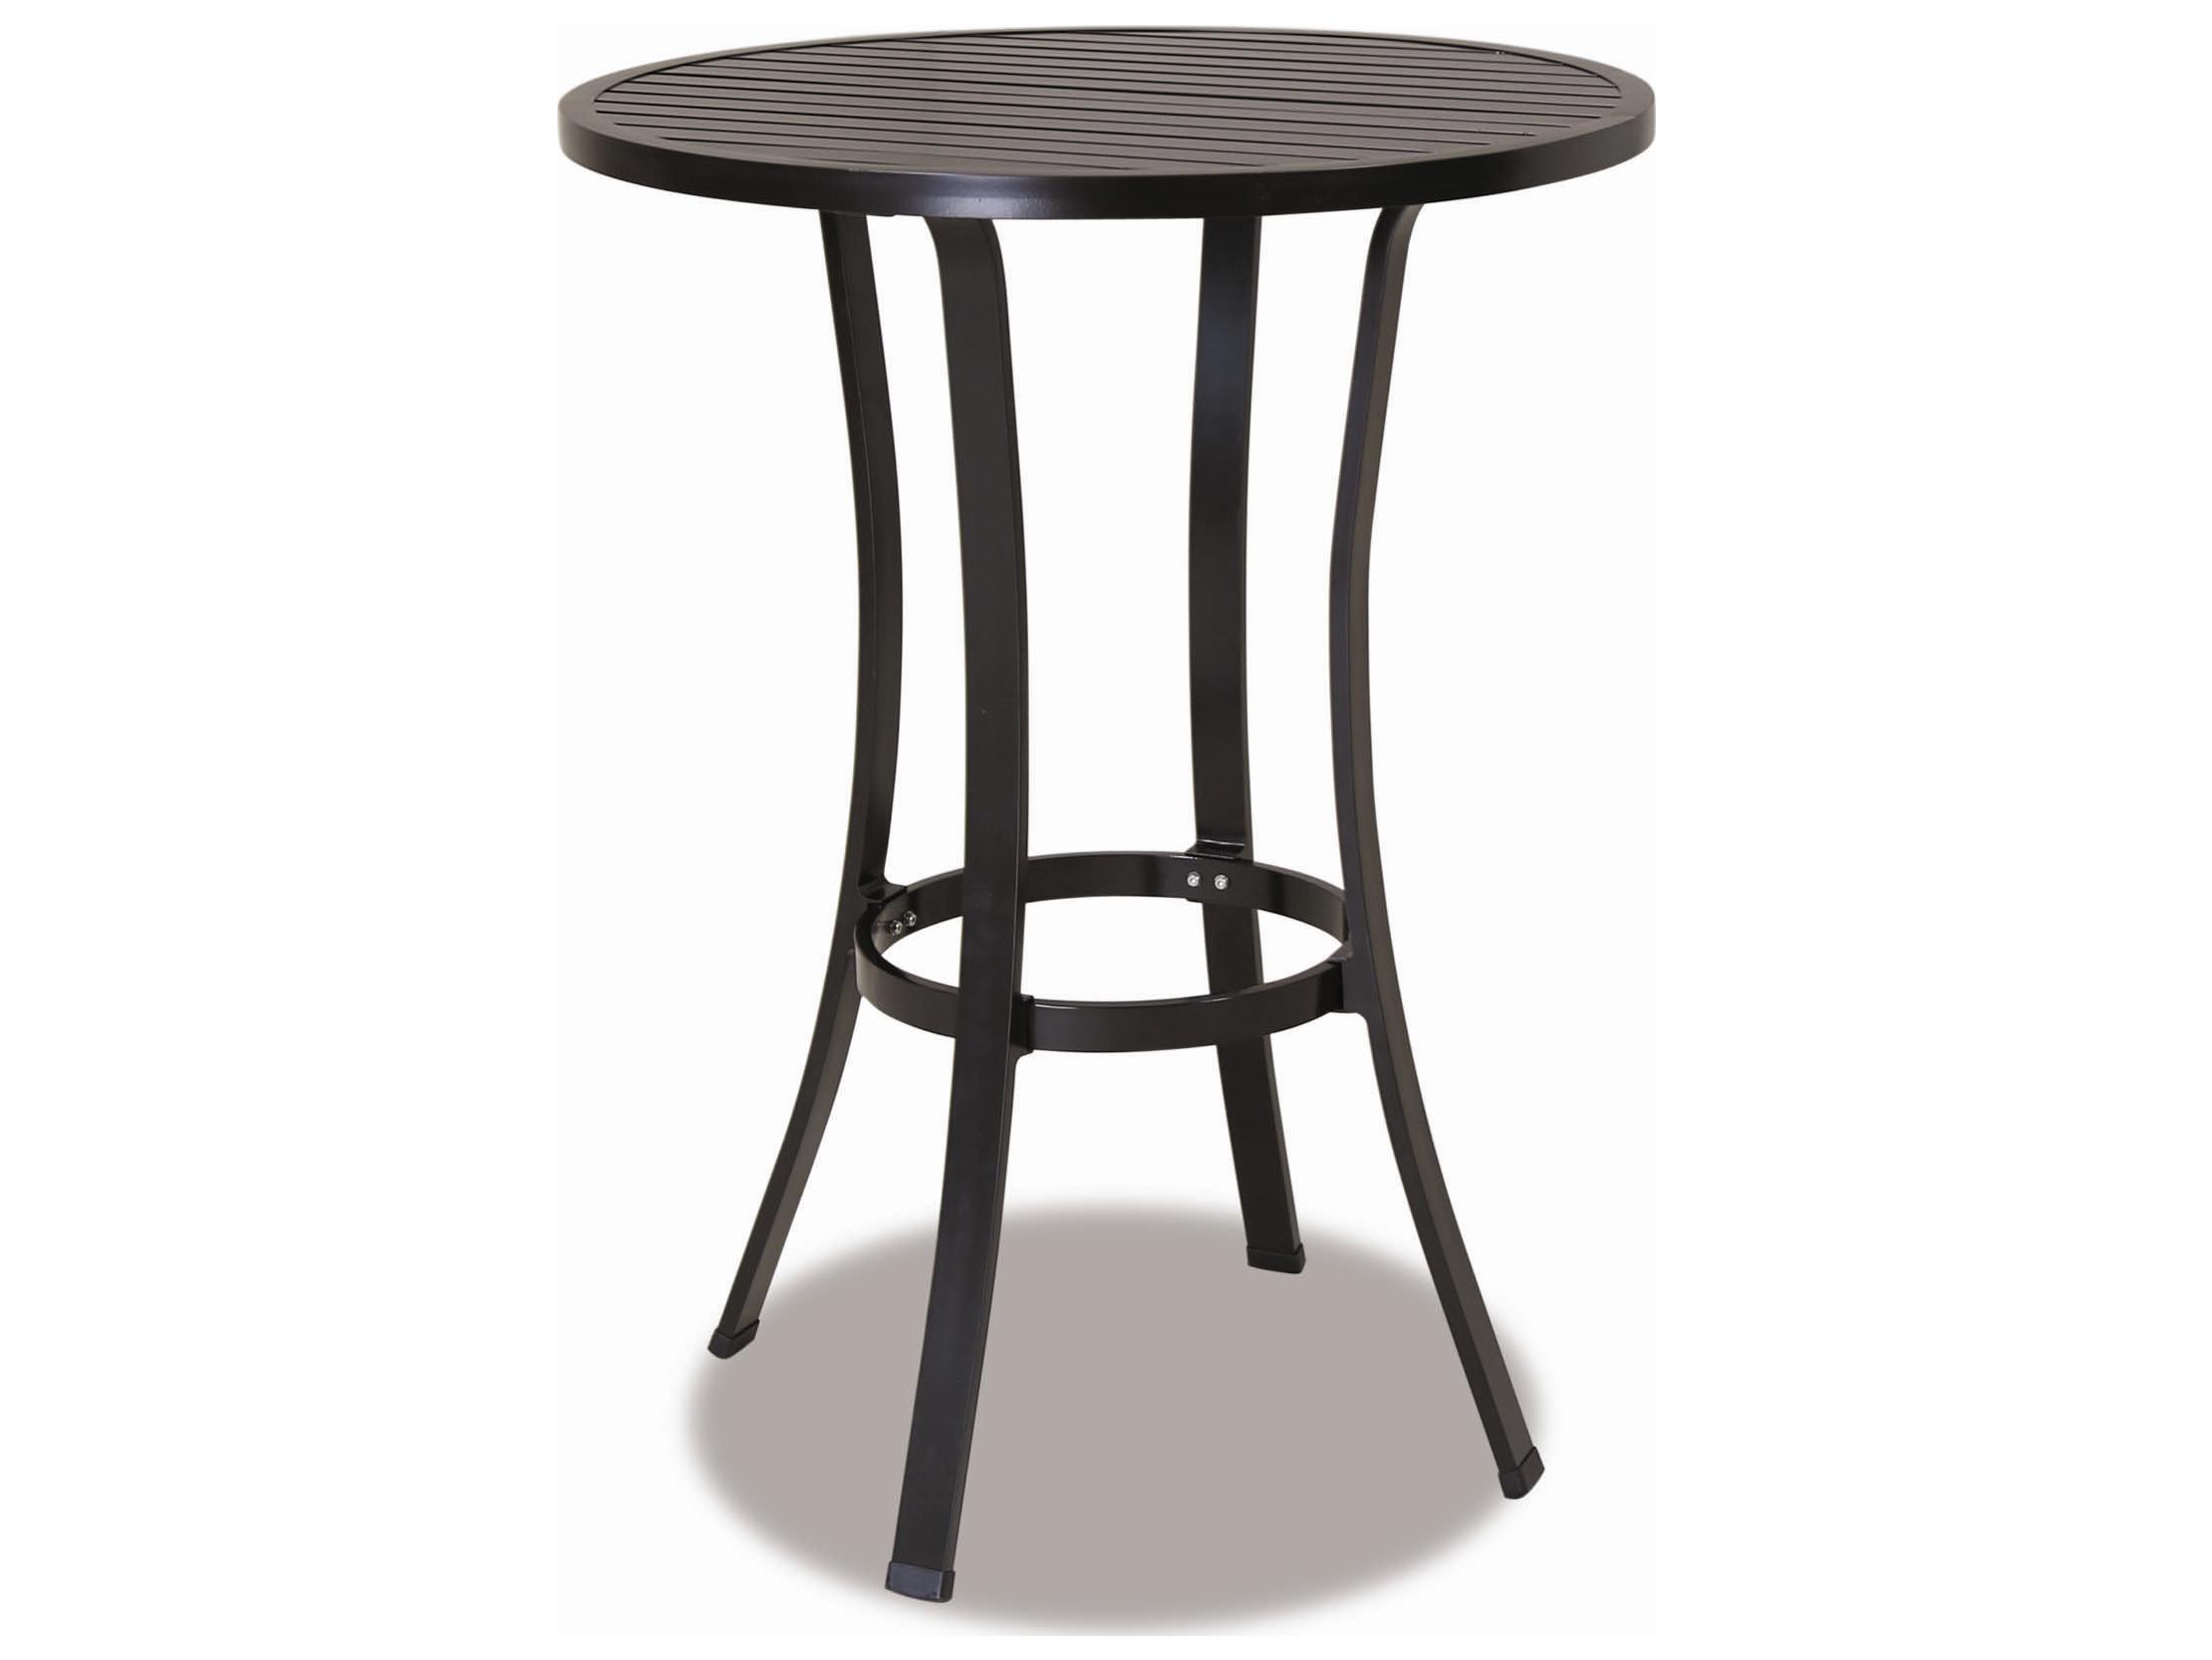 sunset west quick ship la jolla aluminum 32 round pub table 401 pt. Black Bedroom Furniture Sets. Home Design Ideas